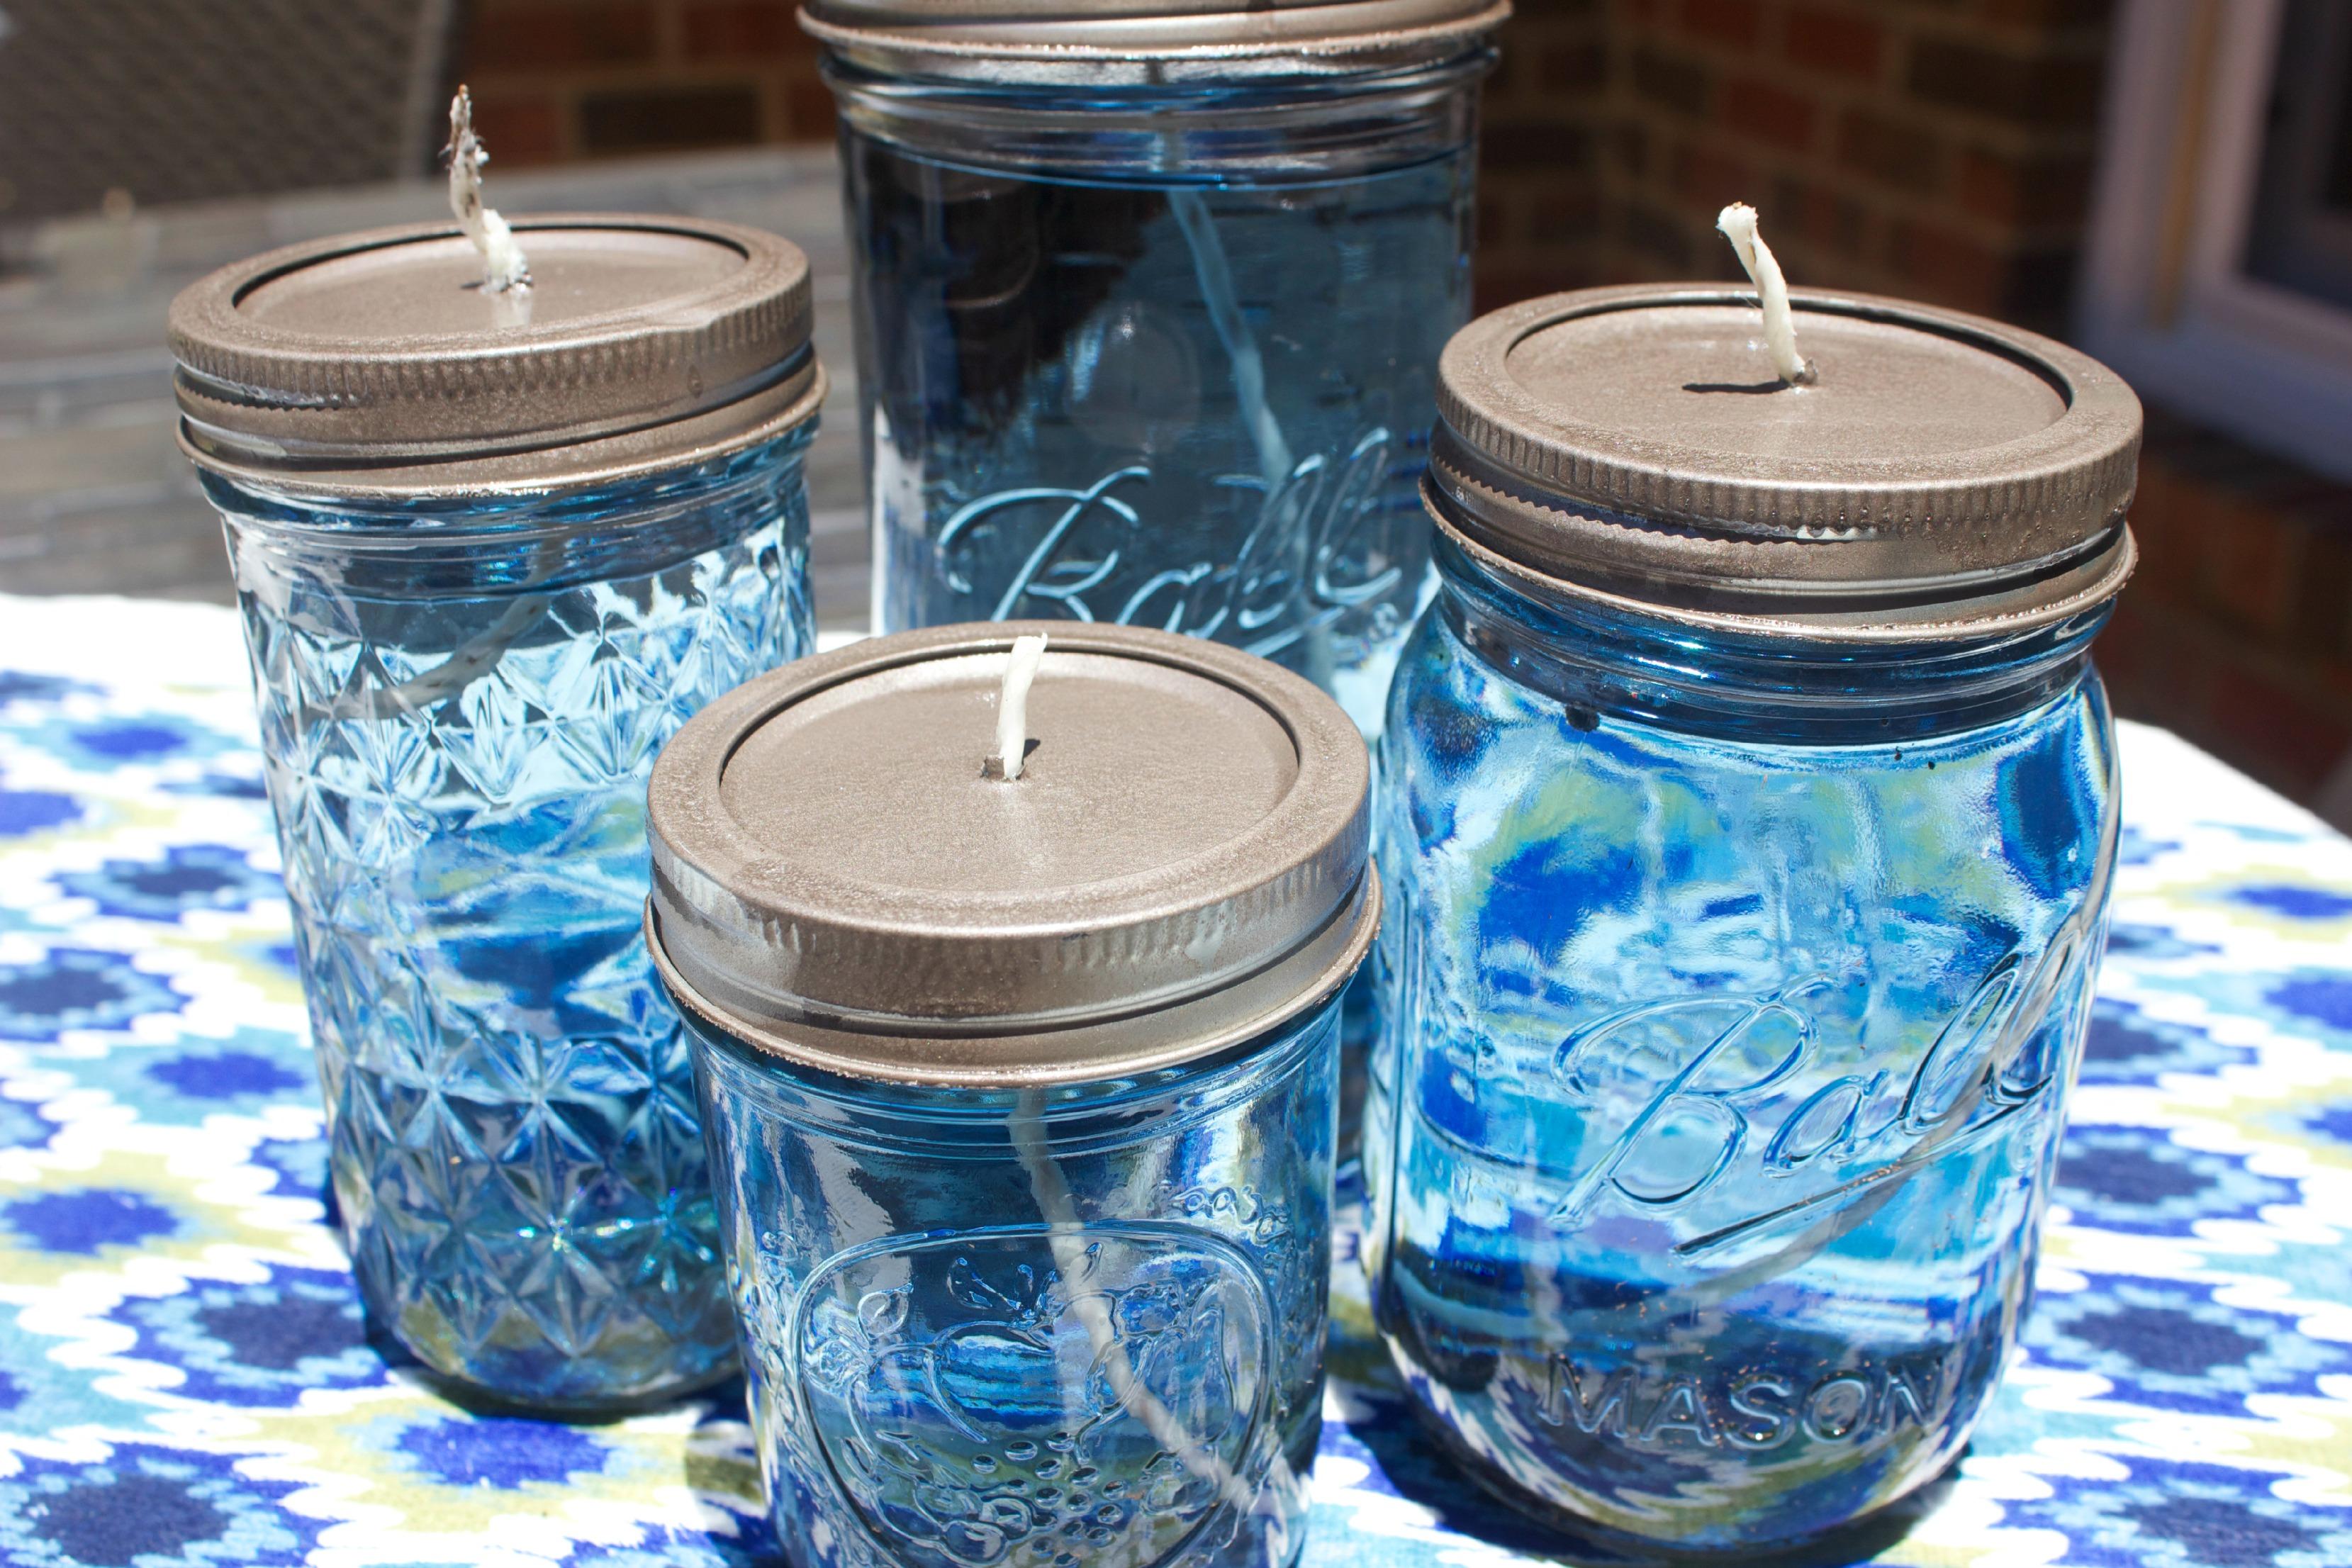 DIY Citronella Mason Jar Candles The Everyday Home Blog www.everydayhomeblog.com (14)